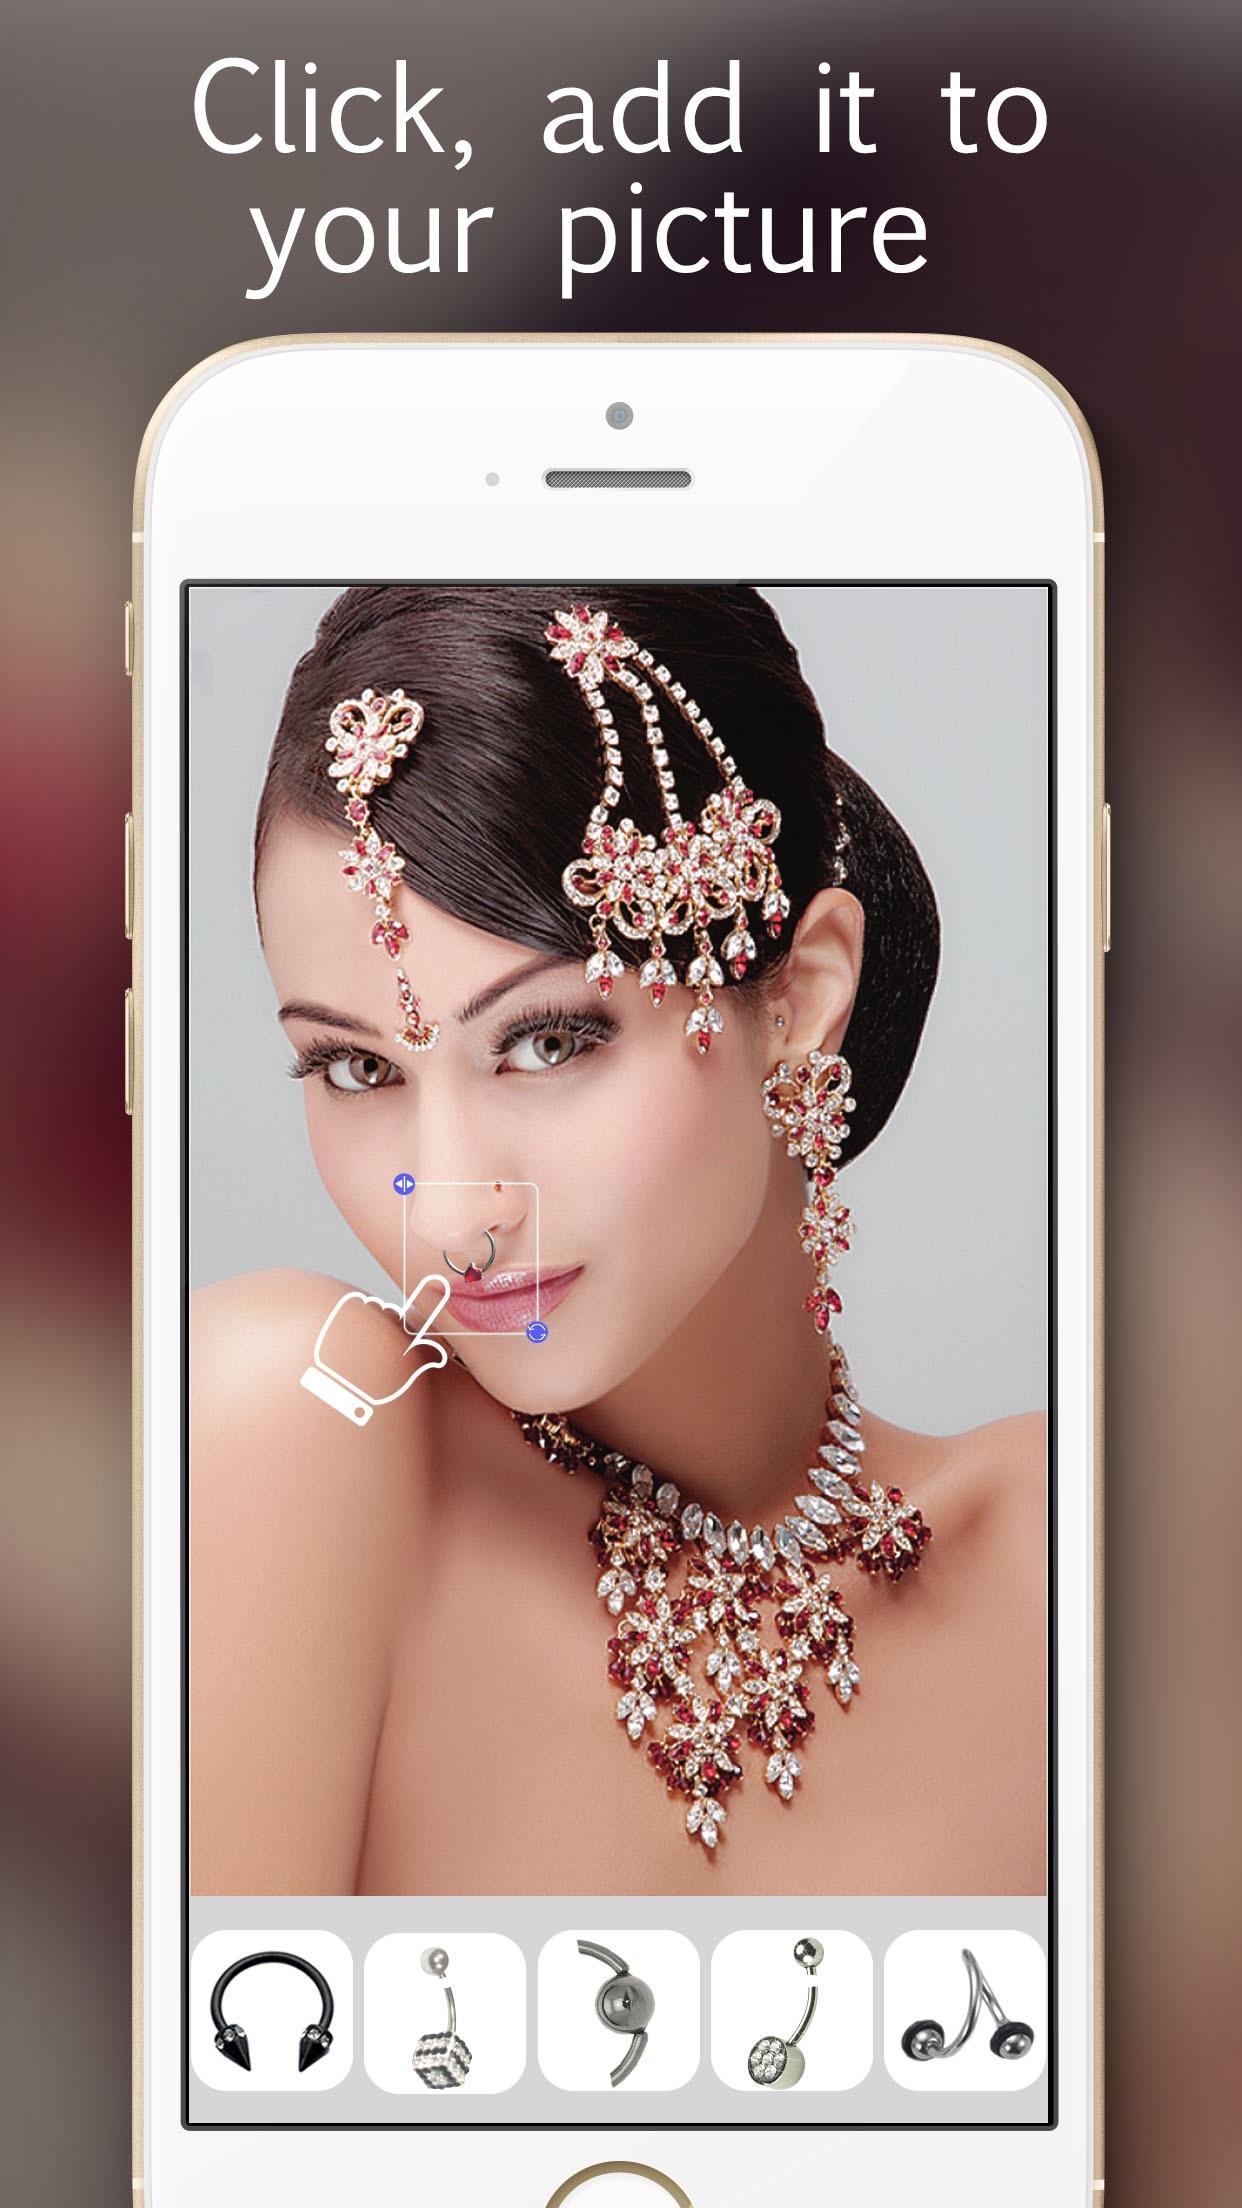 Tattoo & Piercing - Virtual Art Inked & Pierced Designs Photo Salon Screenshot